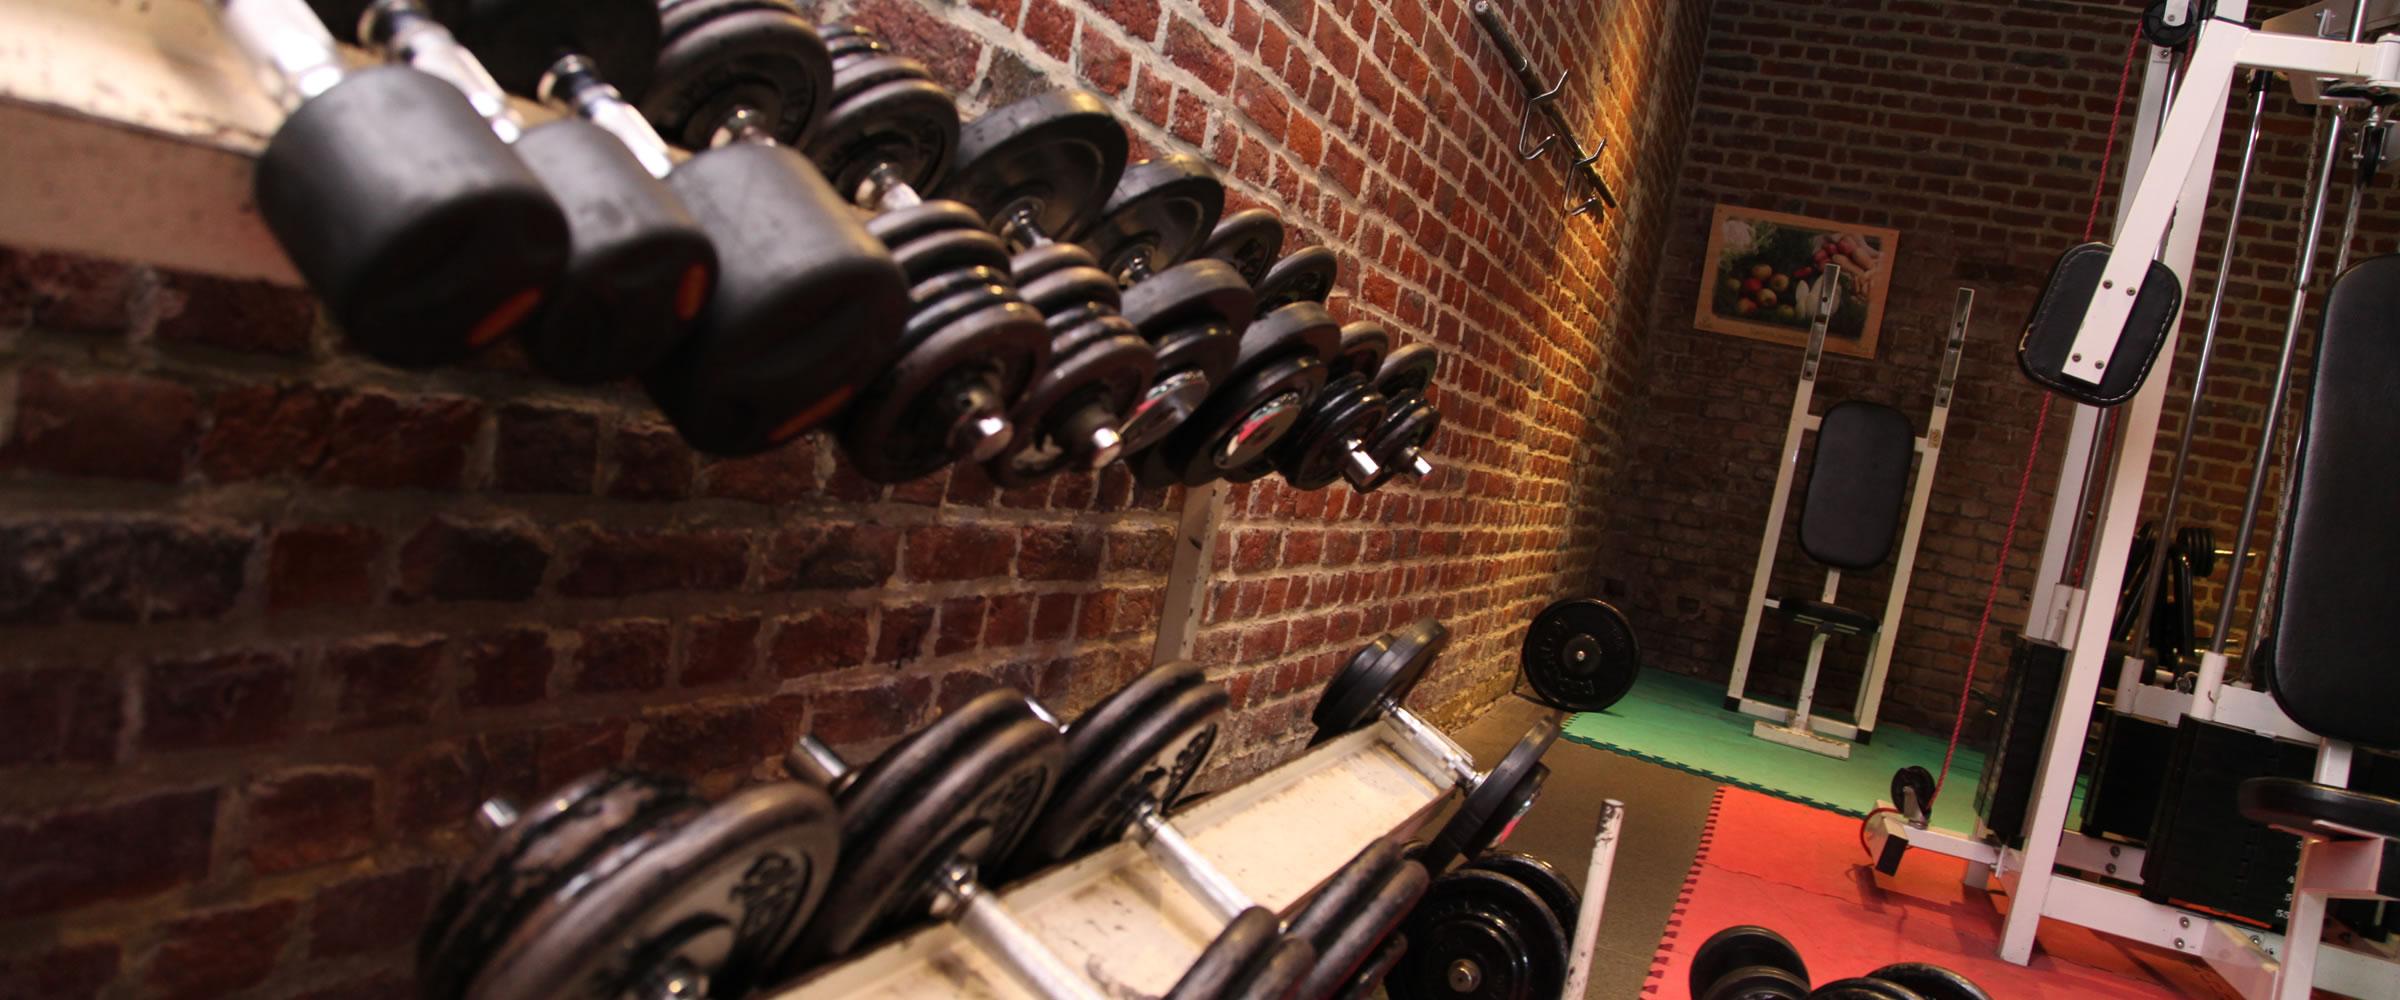 Une salle de Cardio-training / Musculation